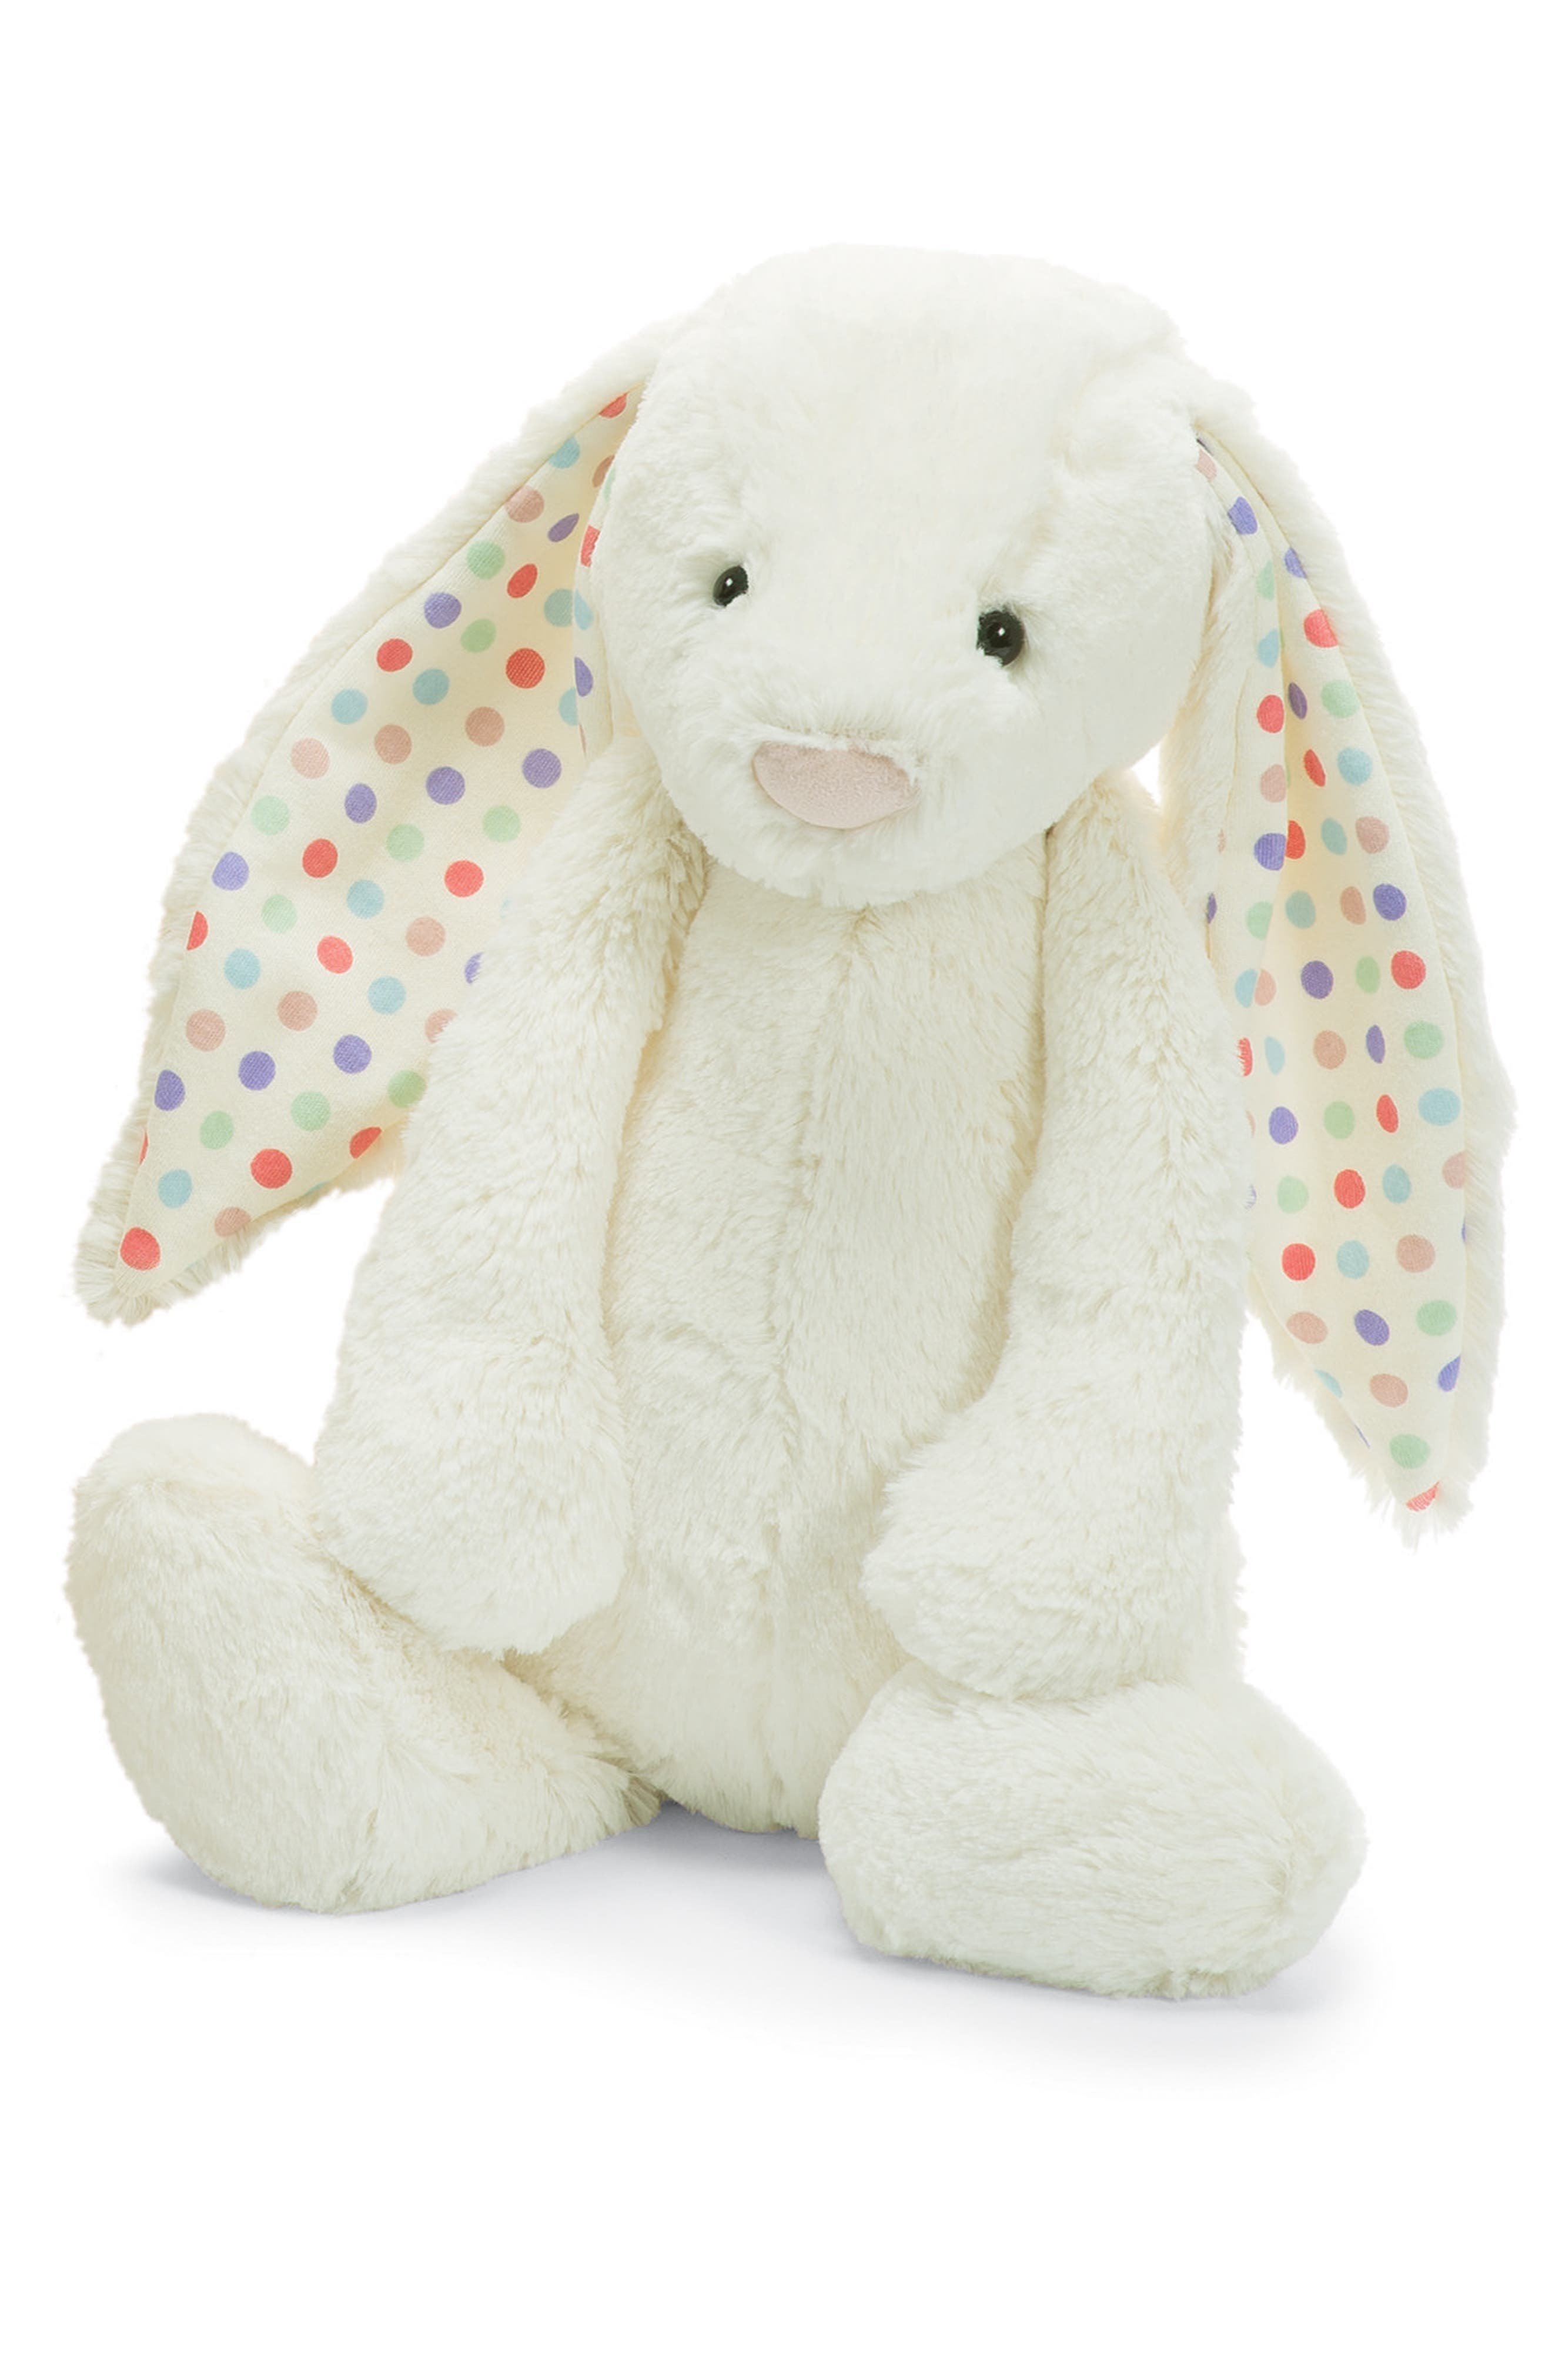 Alternate Image 1 Selected - Jellycat 'Huge Bashful Bunny' Stuffed Animal